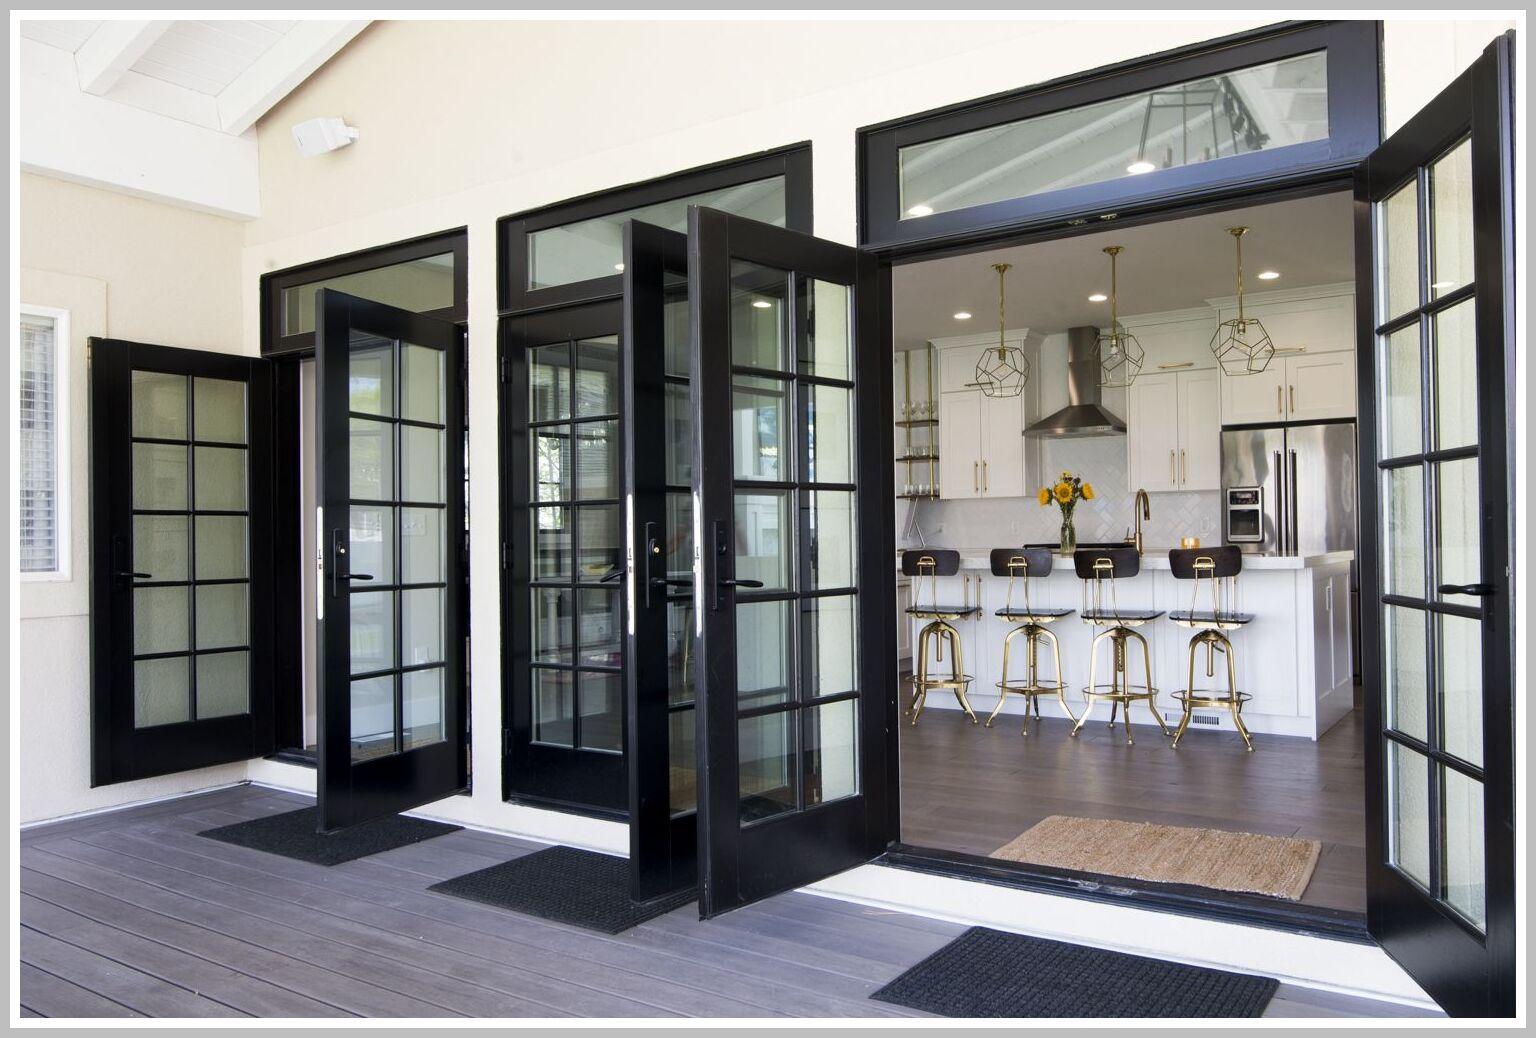 60 Reference Of Patio Door Double Glazing Unit In 2020 French Doors Interior French Doors Sliding Patio Doors